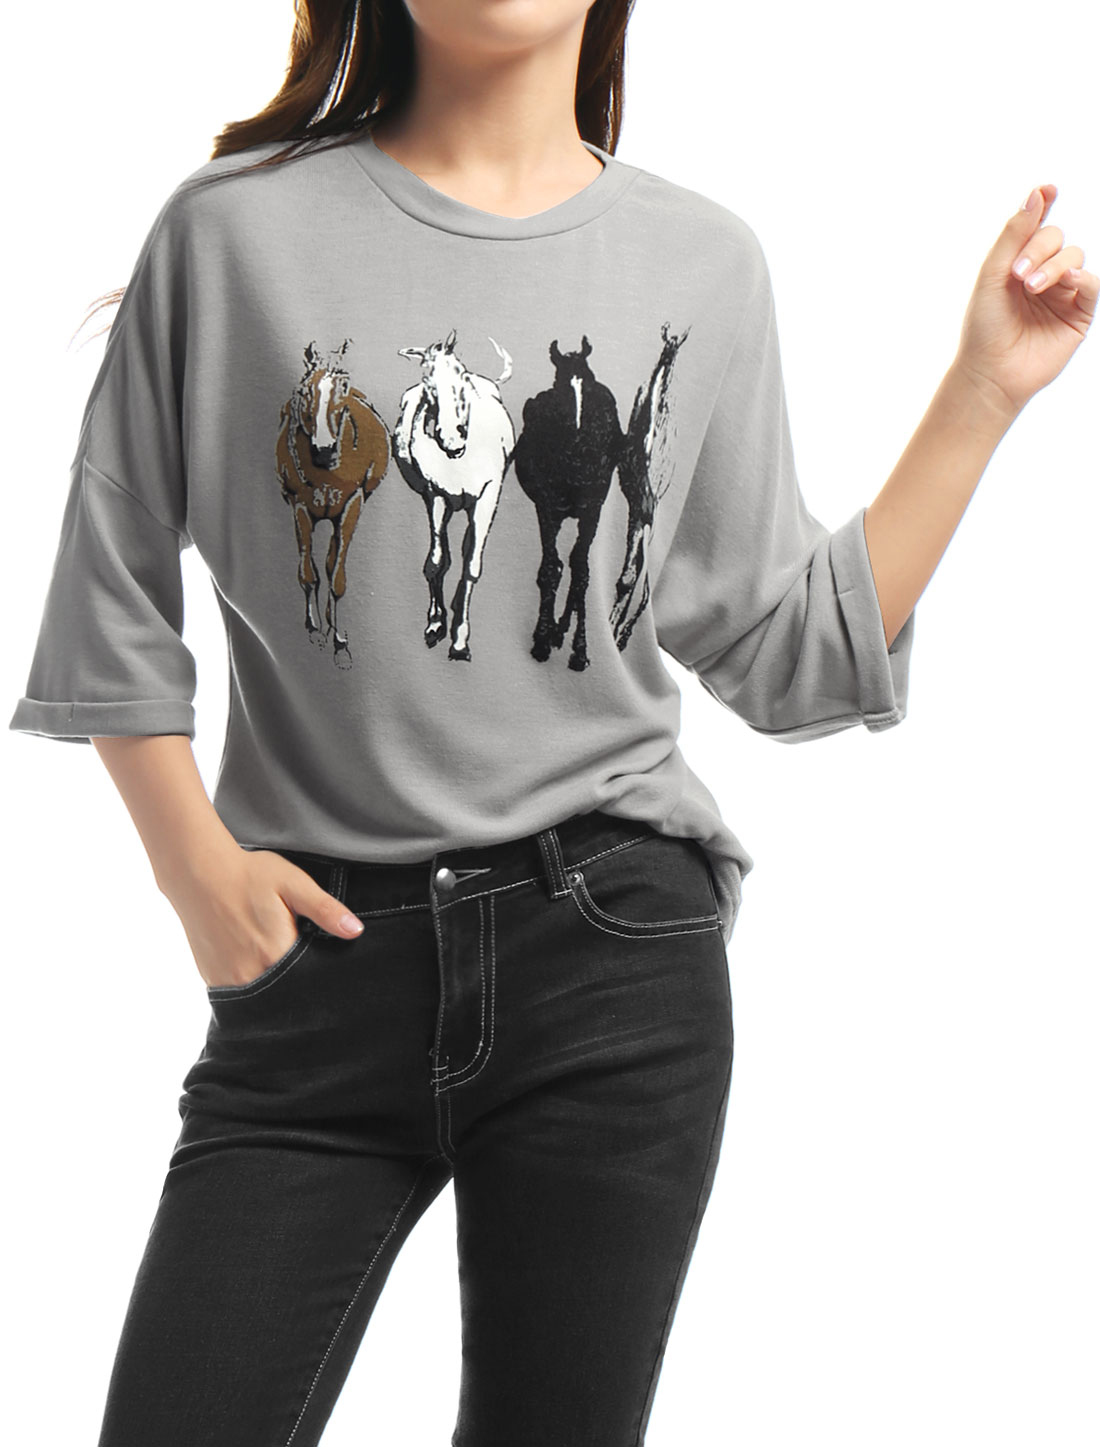 Allegra K Woman Drop 3/4 Sleeves Horse Print Tunic Loose Top Gray S